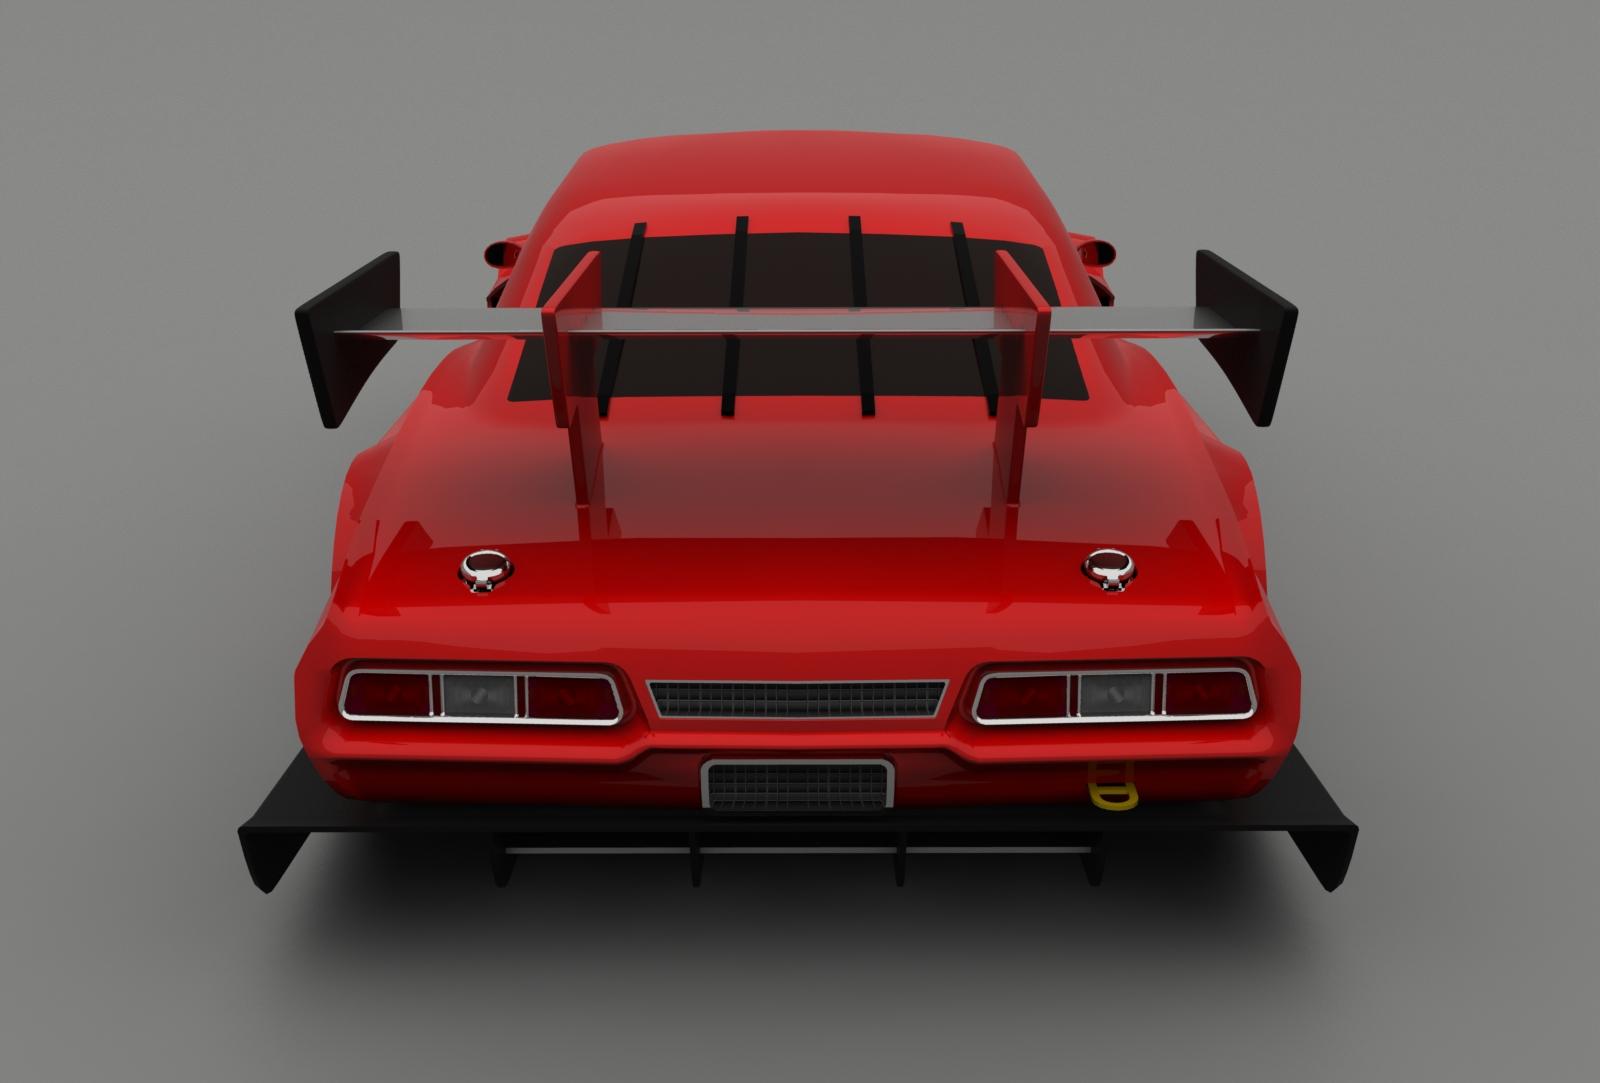 2013-03_The Crew_F.Beudin_Chevrolet Impala-1967-Racing2 Design_05